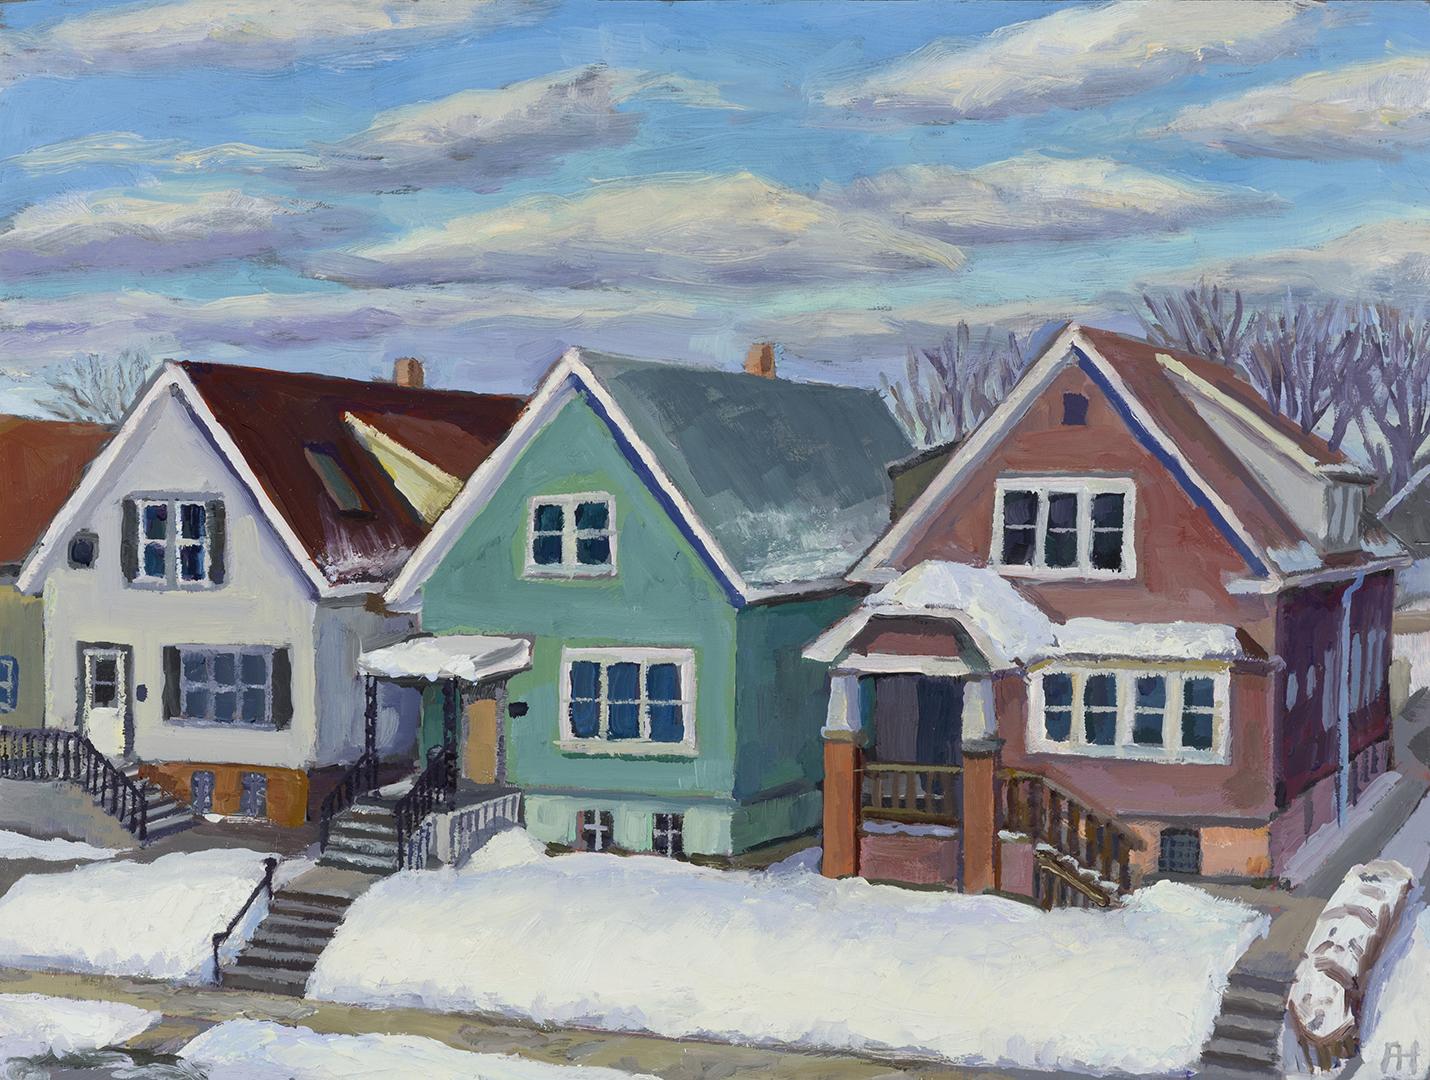 "Neighbors Up the Street, oil on wood, 6"" x 8"", 2021"